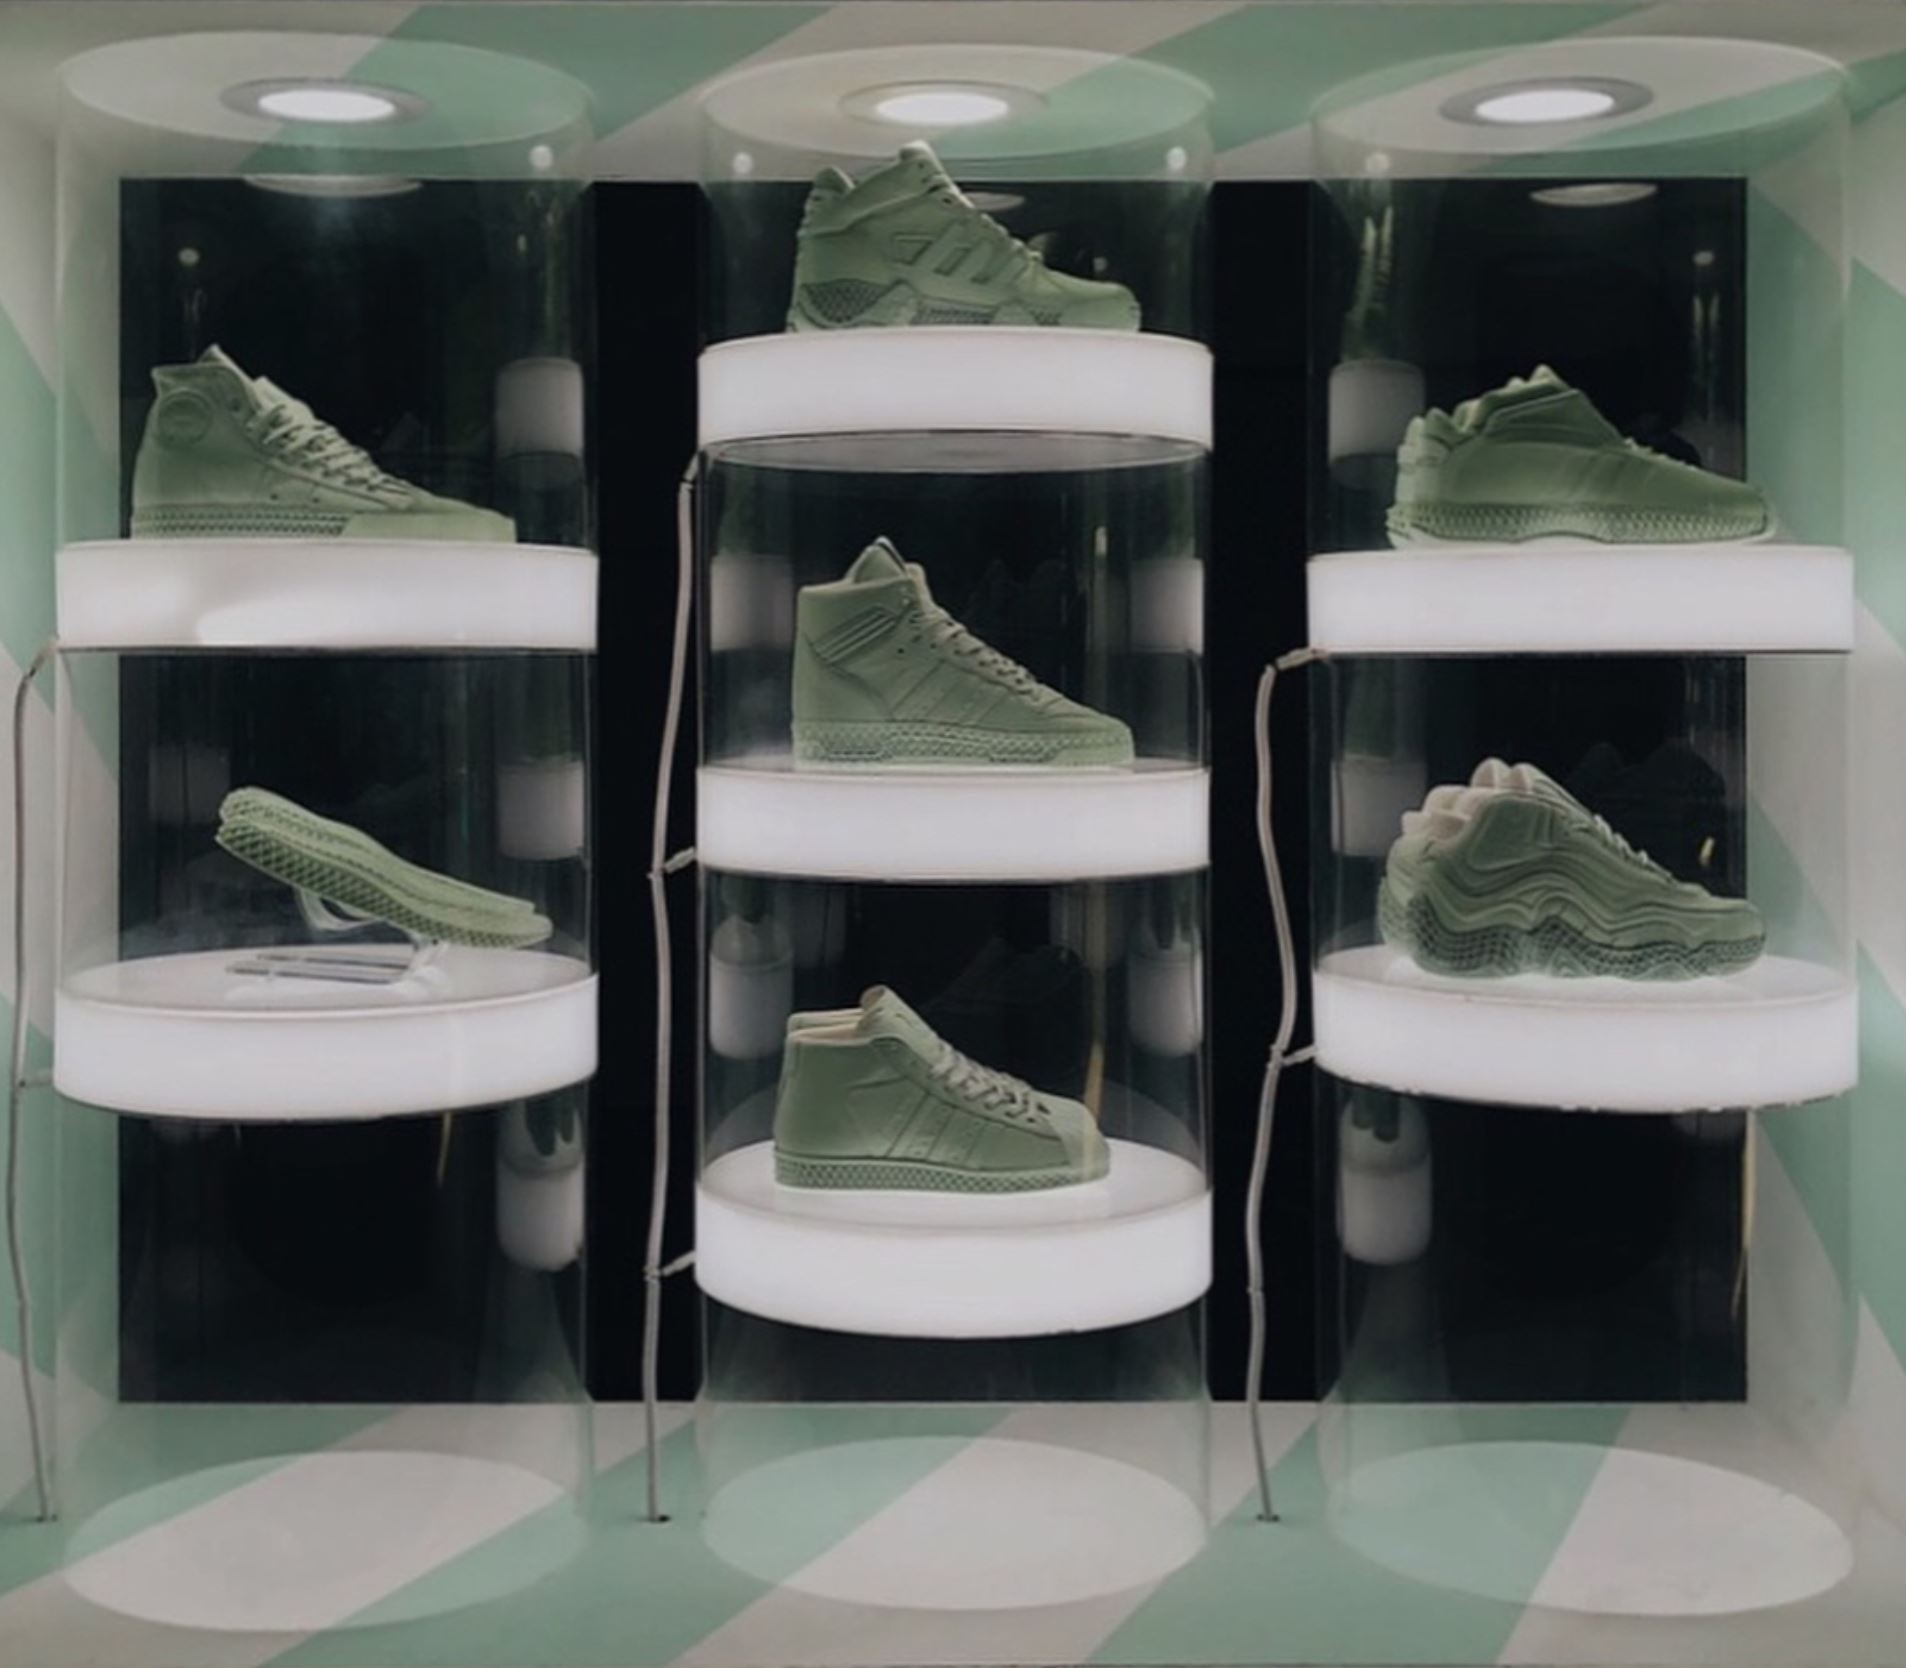 adidas originals futurecraft 4D display